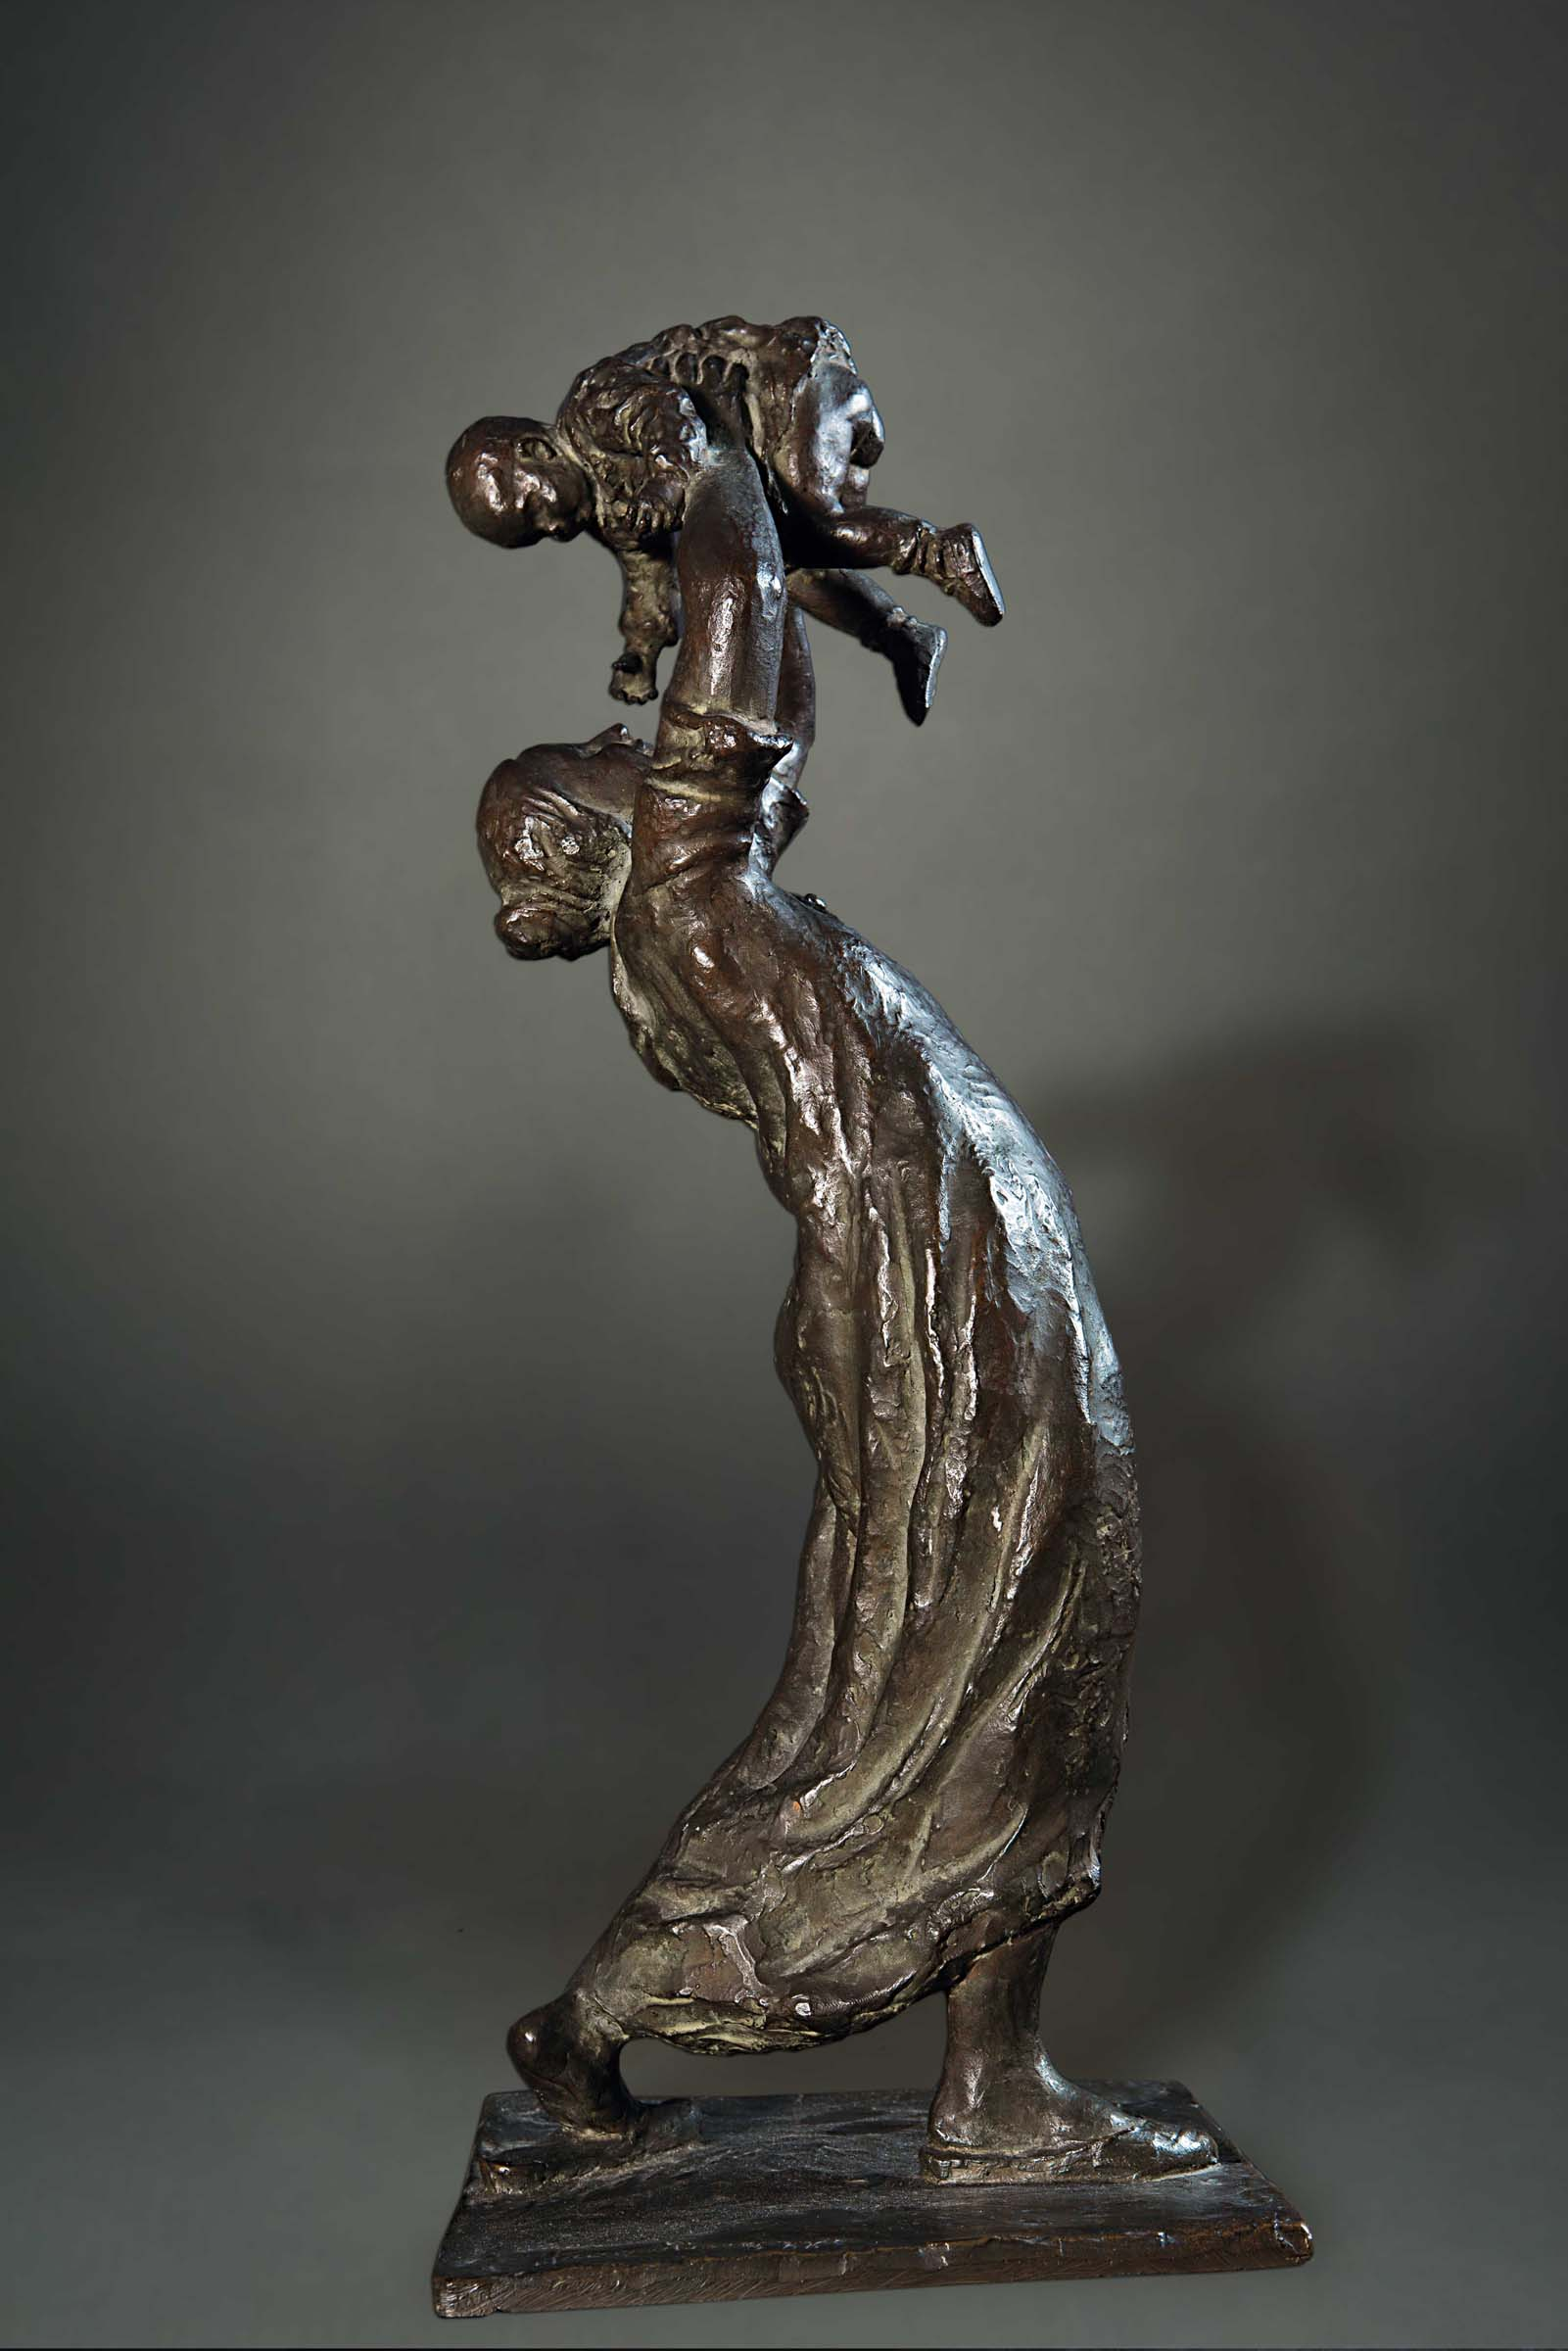 BARGIGGIA 2,bronzo a cera persa, cm 22x20x58